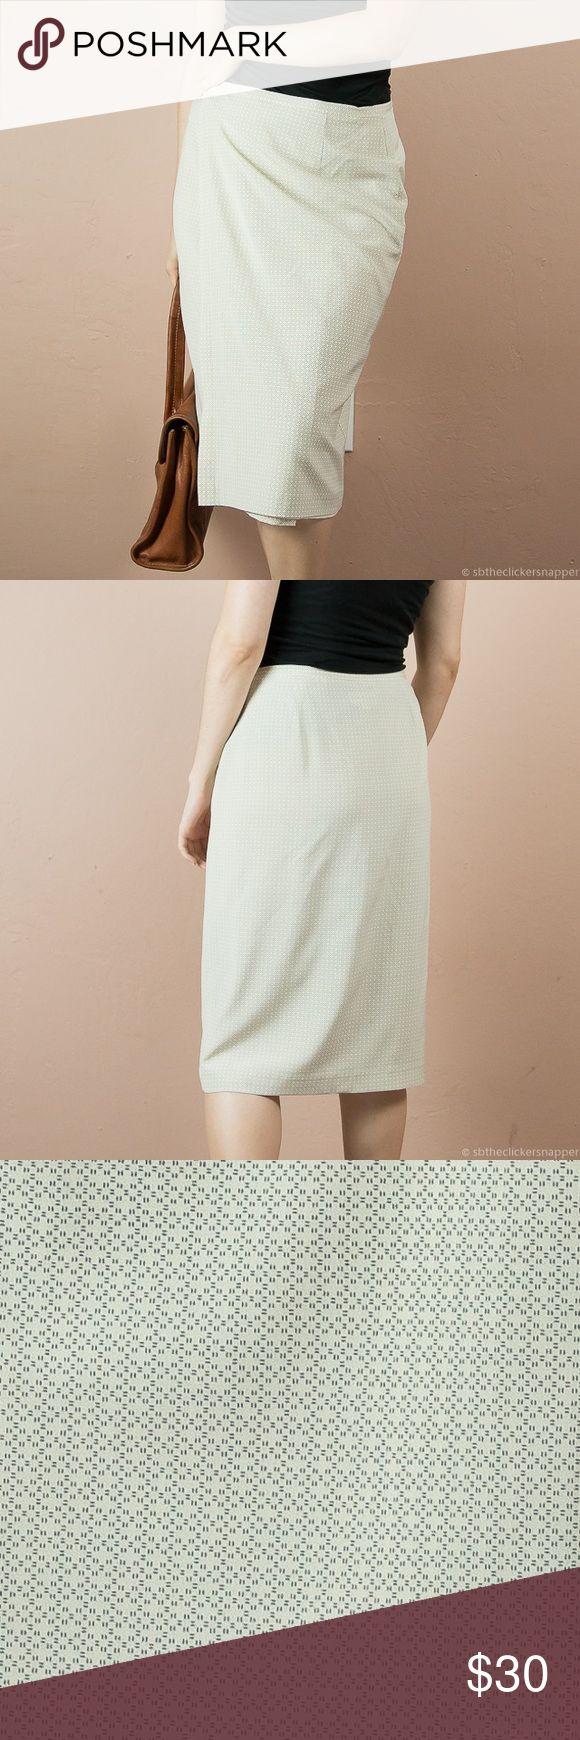 Calvin Klein Wrap Skirt Beige and black print Calvin Klein wrap skirt. Very easy to wear and pair. Shell: 95% silk, 5% Lycra. Lining: 100% polyester. Calvin Klein Skirts Midi